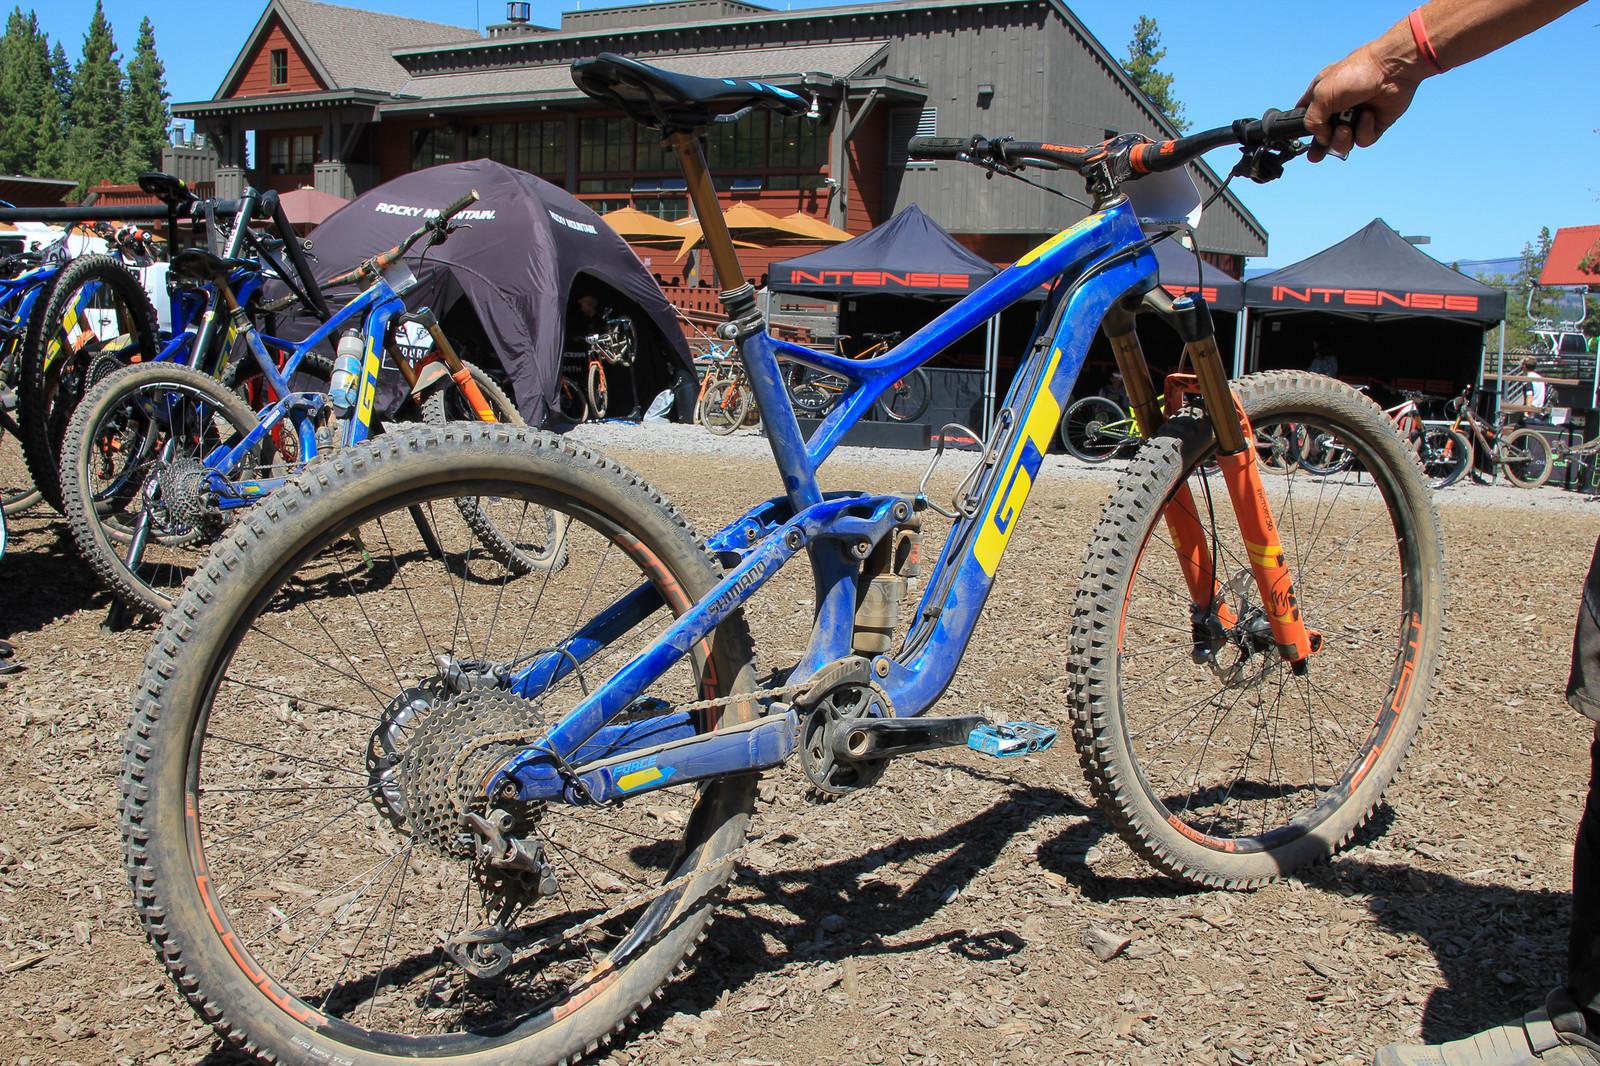 Martin Maes is Back - Pit Bits 2019 Enduro World Series - Northstar - Mountain Biking Pictures - Vital MTB